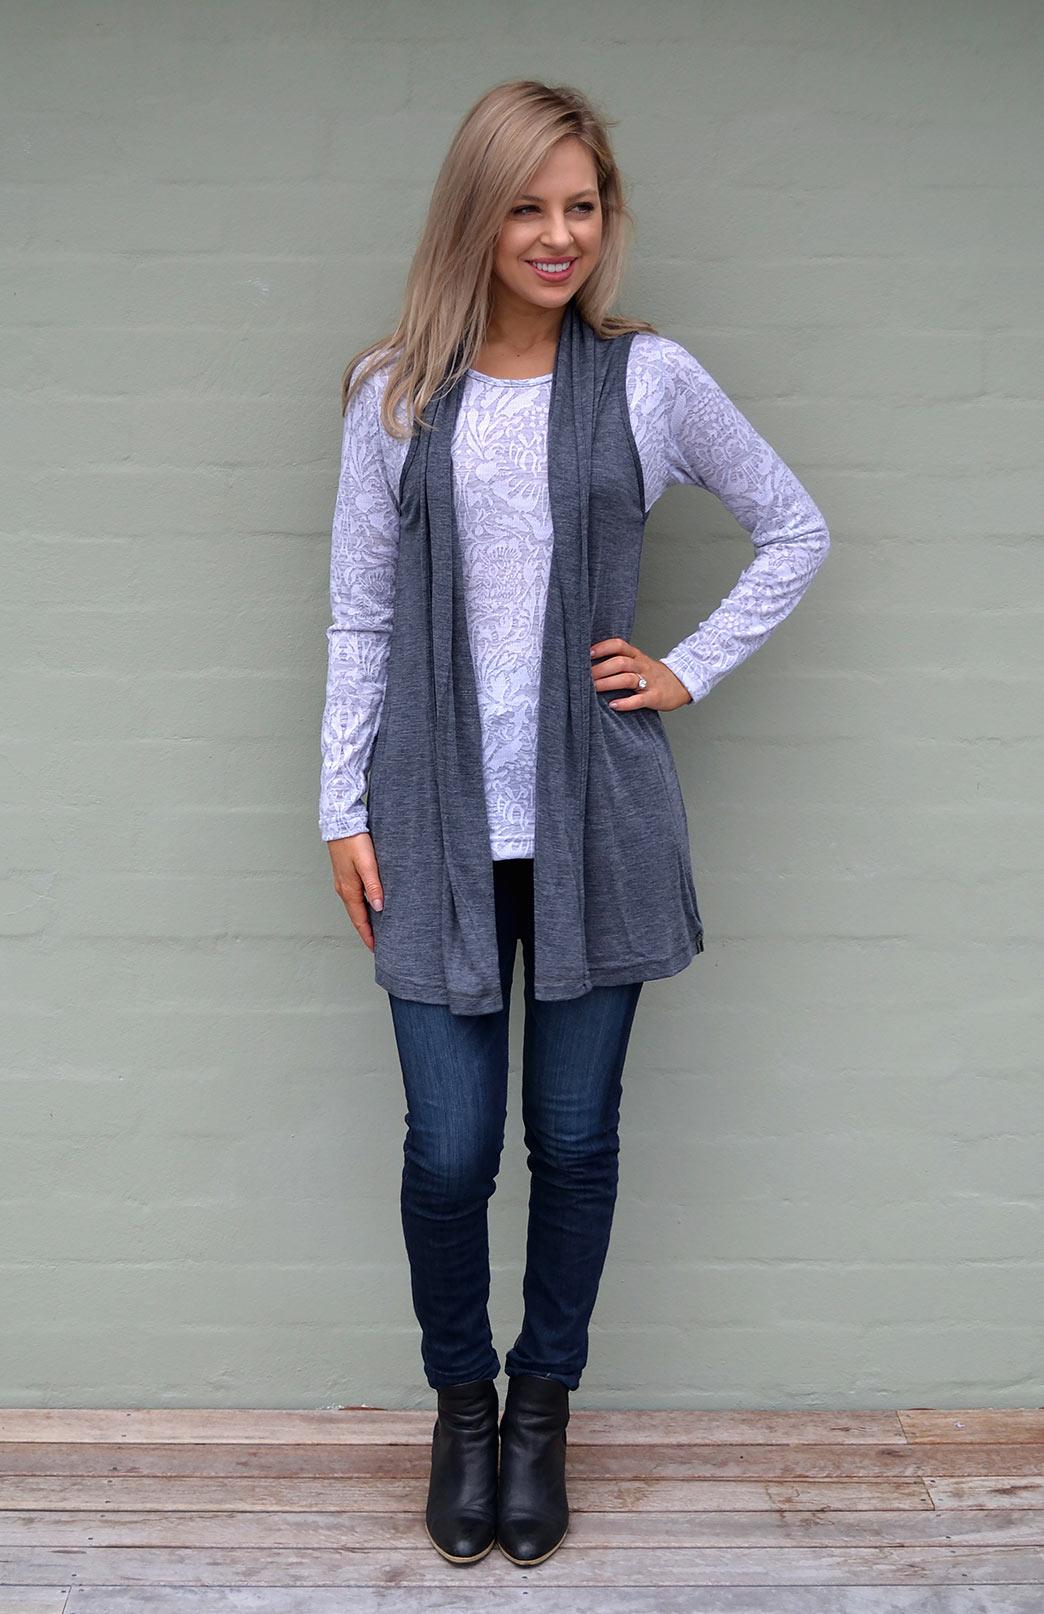 9a9ef62b8e86e Sleeveless Drape Cardigan - Women s Merino Wool Sleeveless Drape Cardigan -  Smitten Merino Tasmania Australia